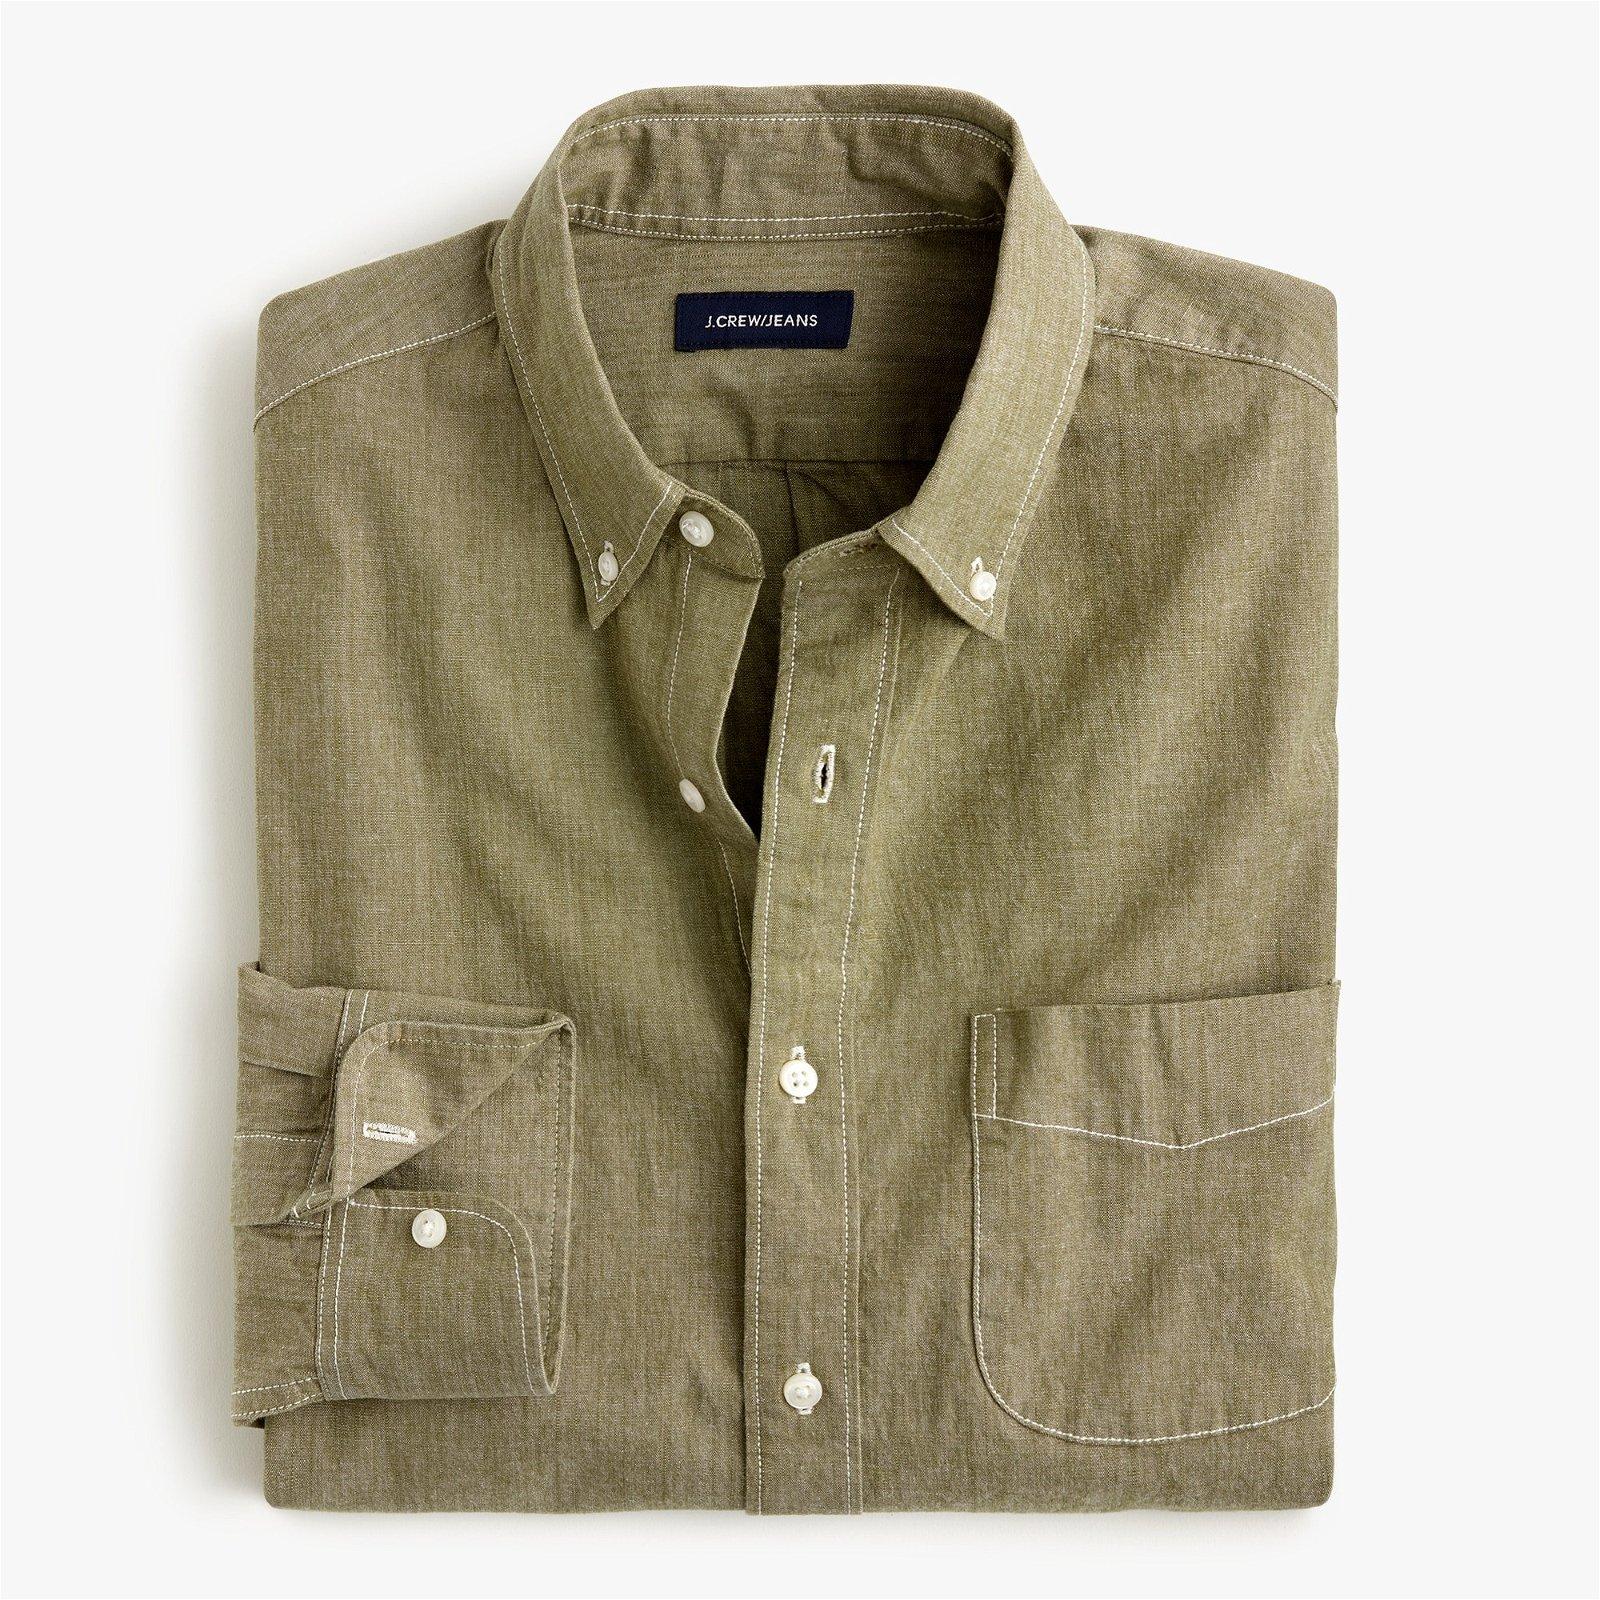 Slim stretch colored chambray shirt